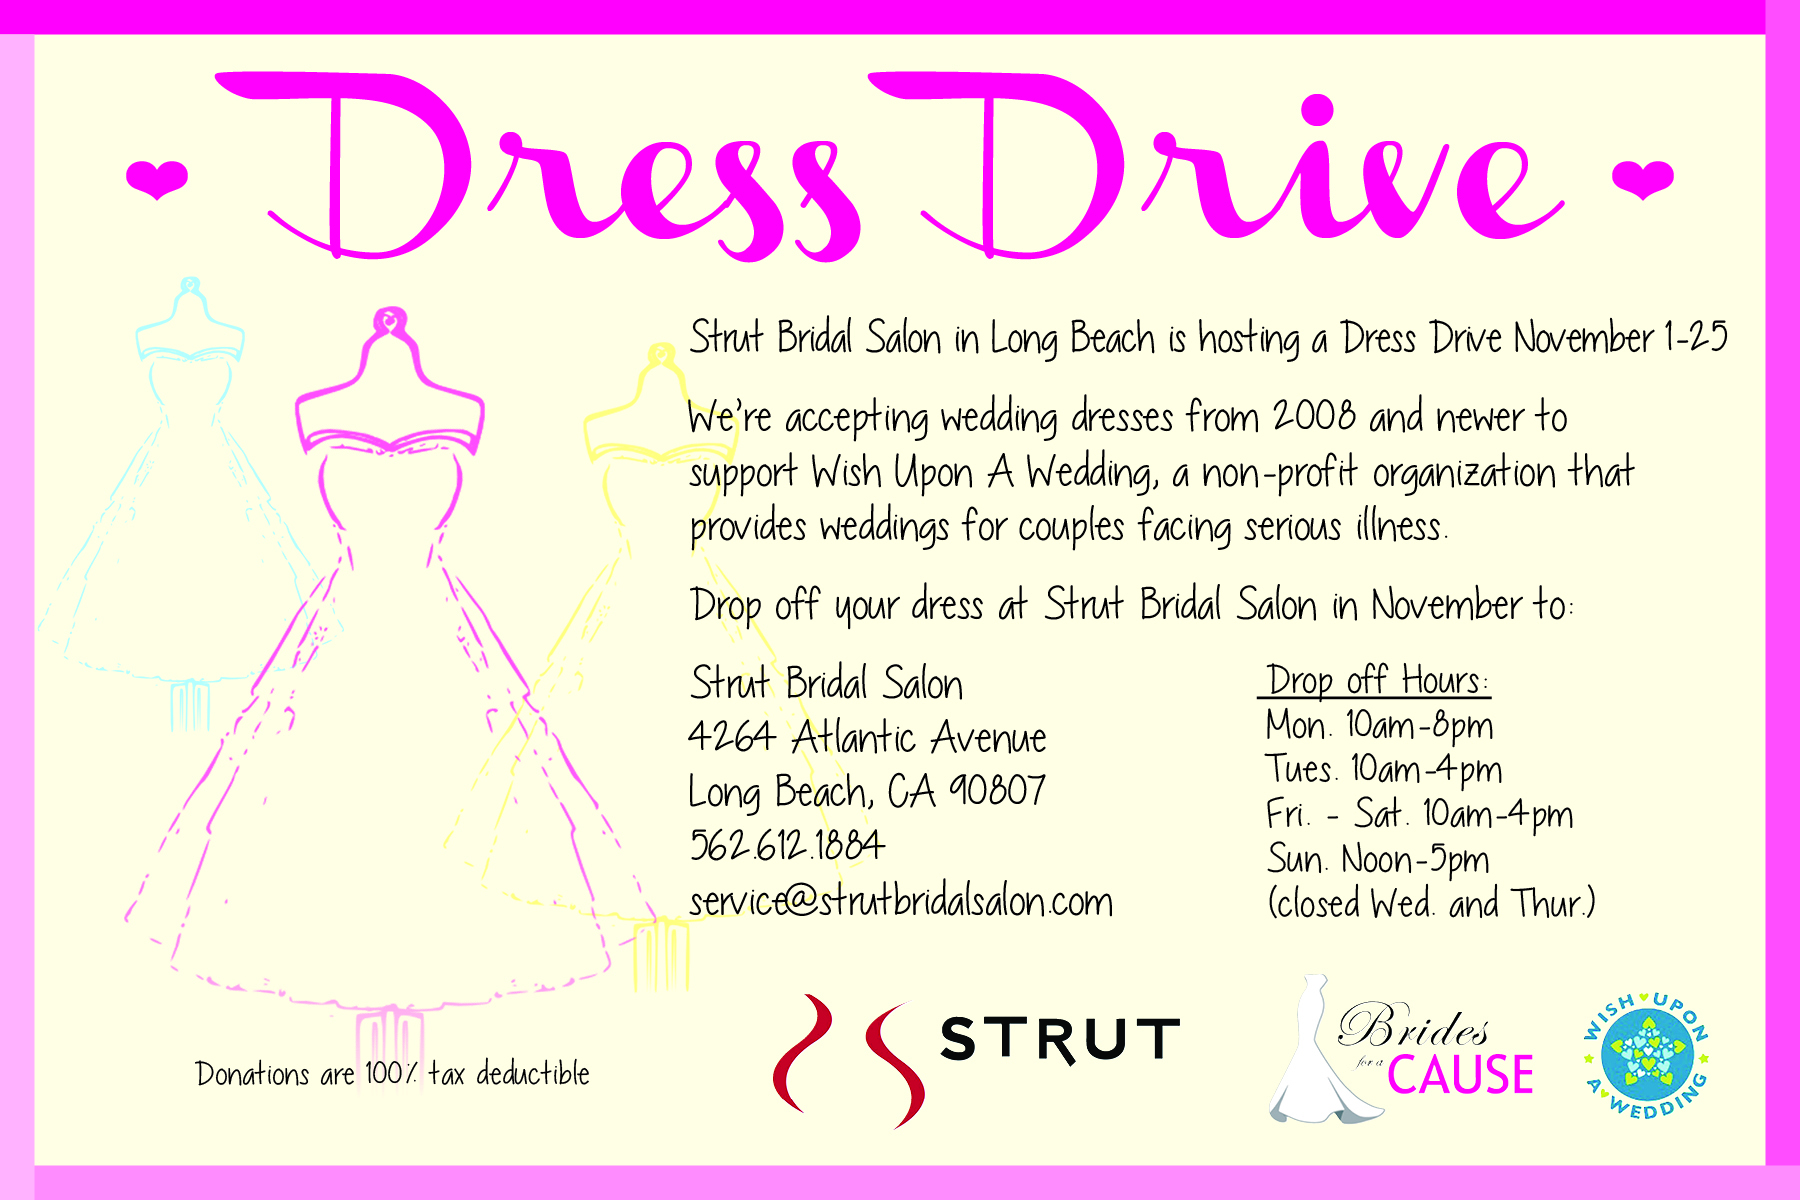 Los Angeles Wedding Dress Donation Drive